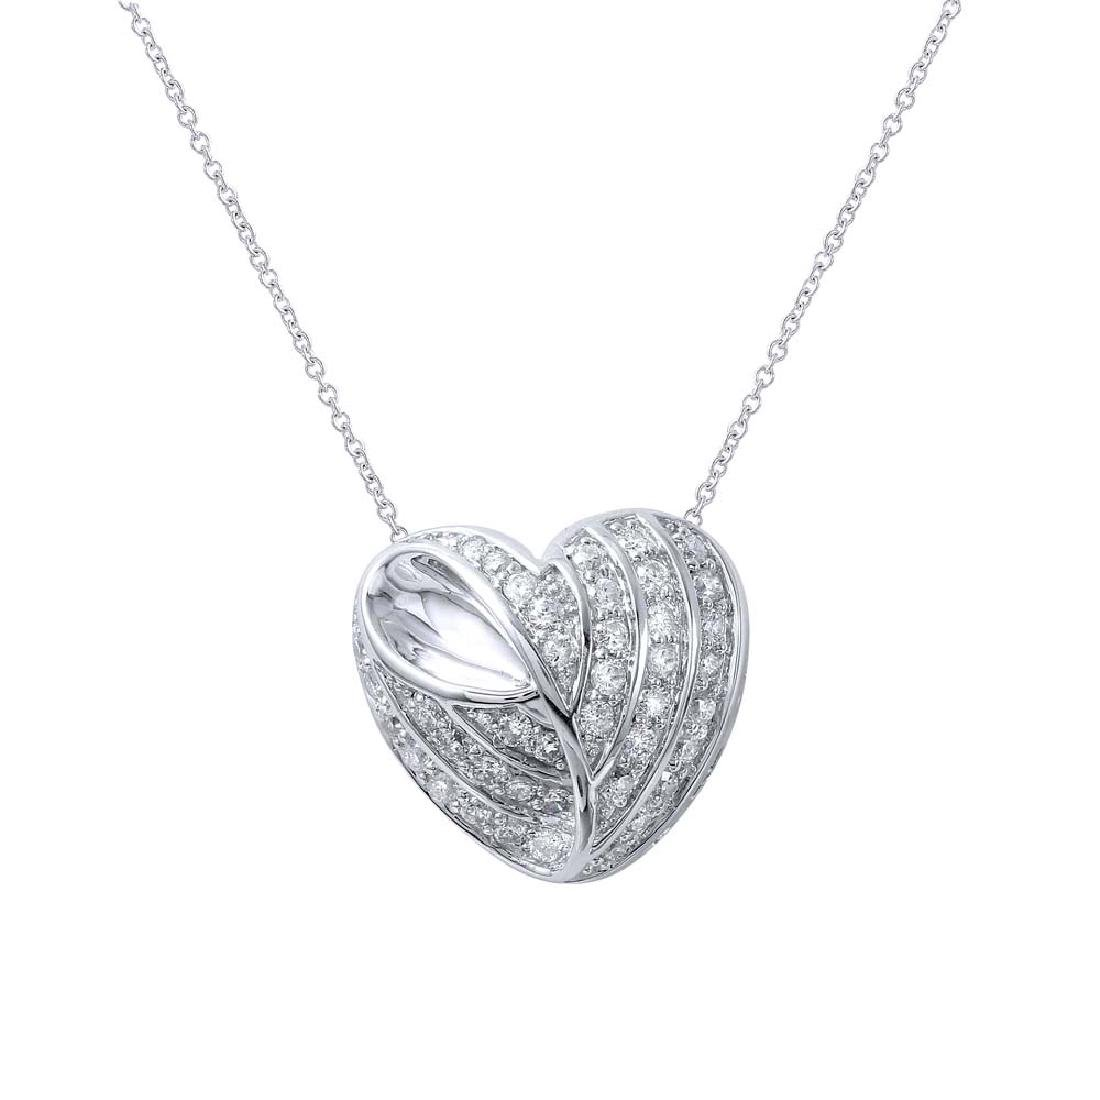 Genuine 0.71 TCW 18K White Gold Ladies Necklace